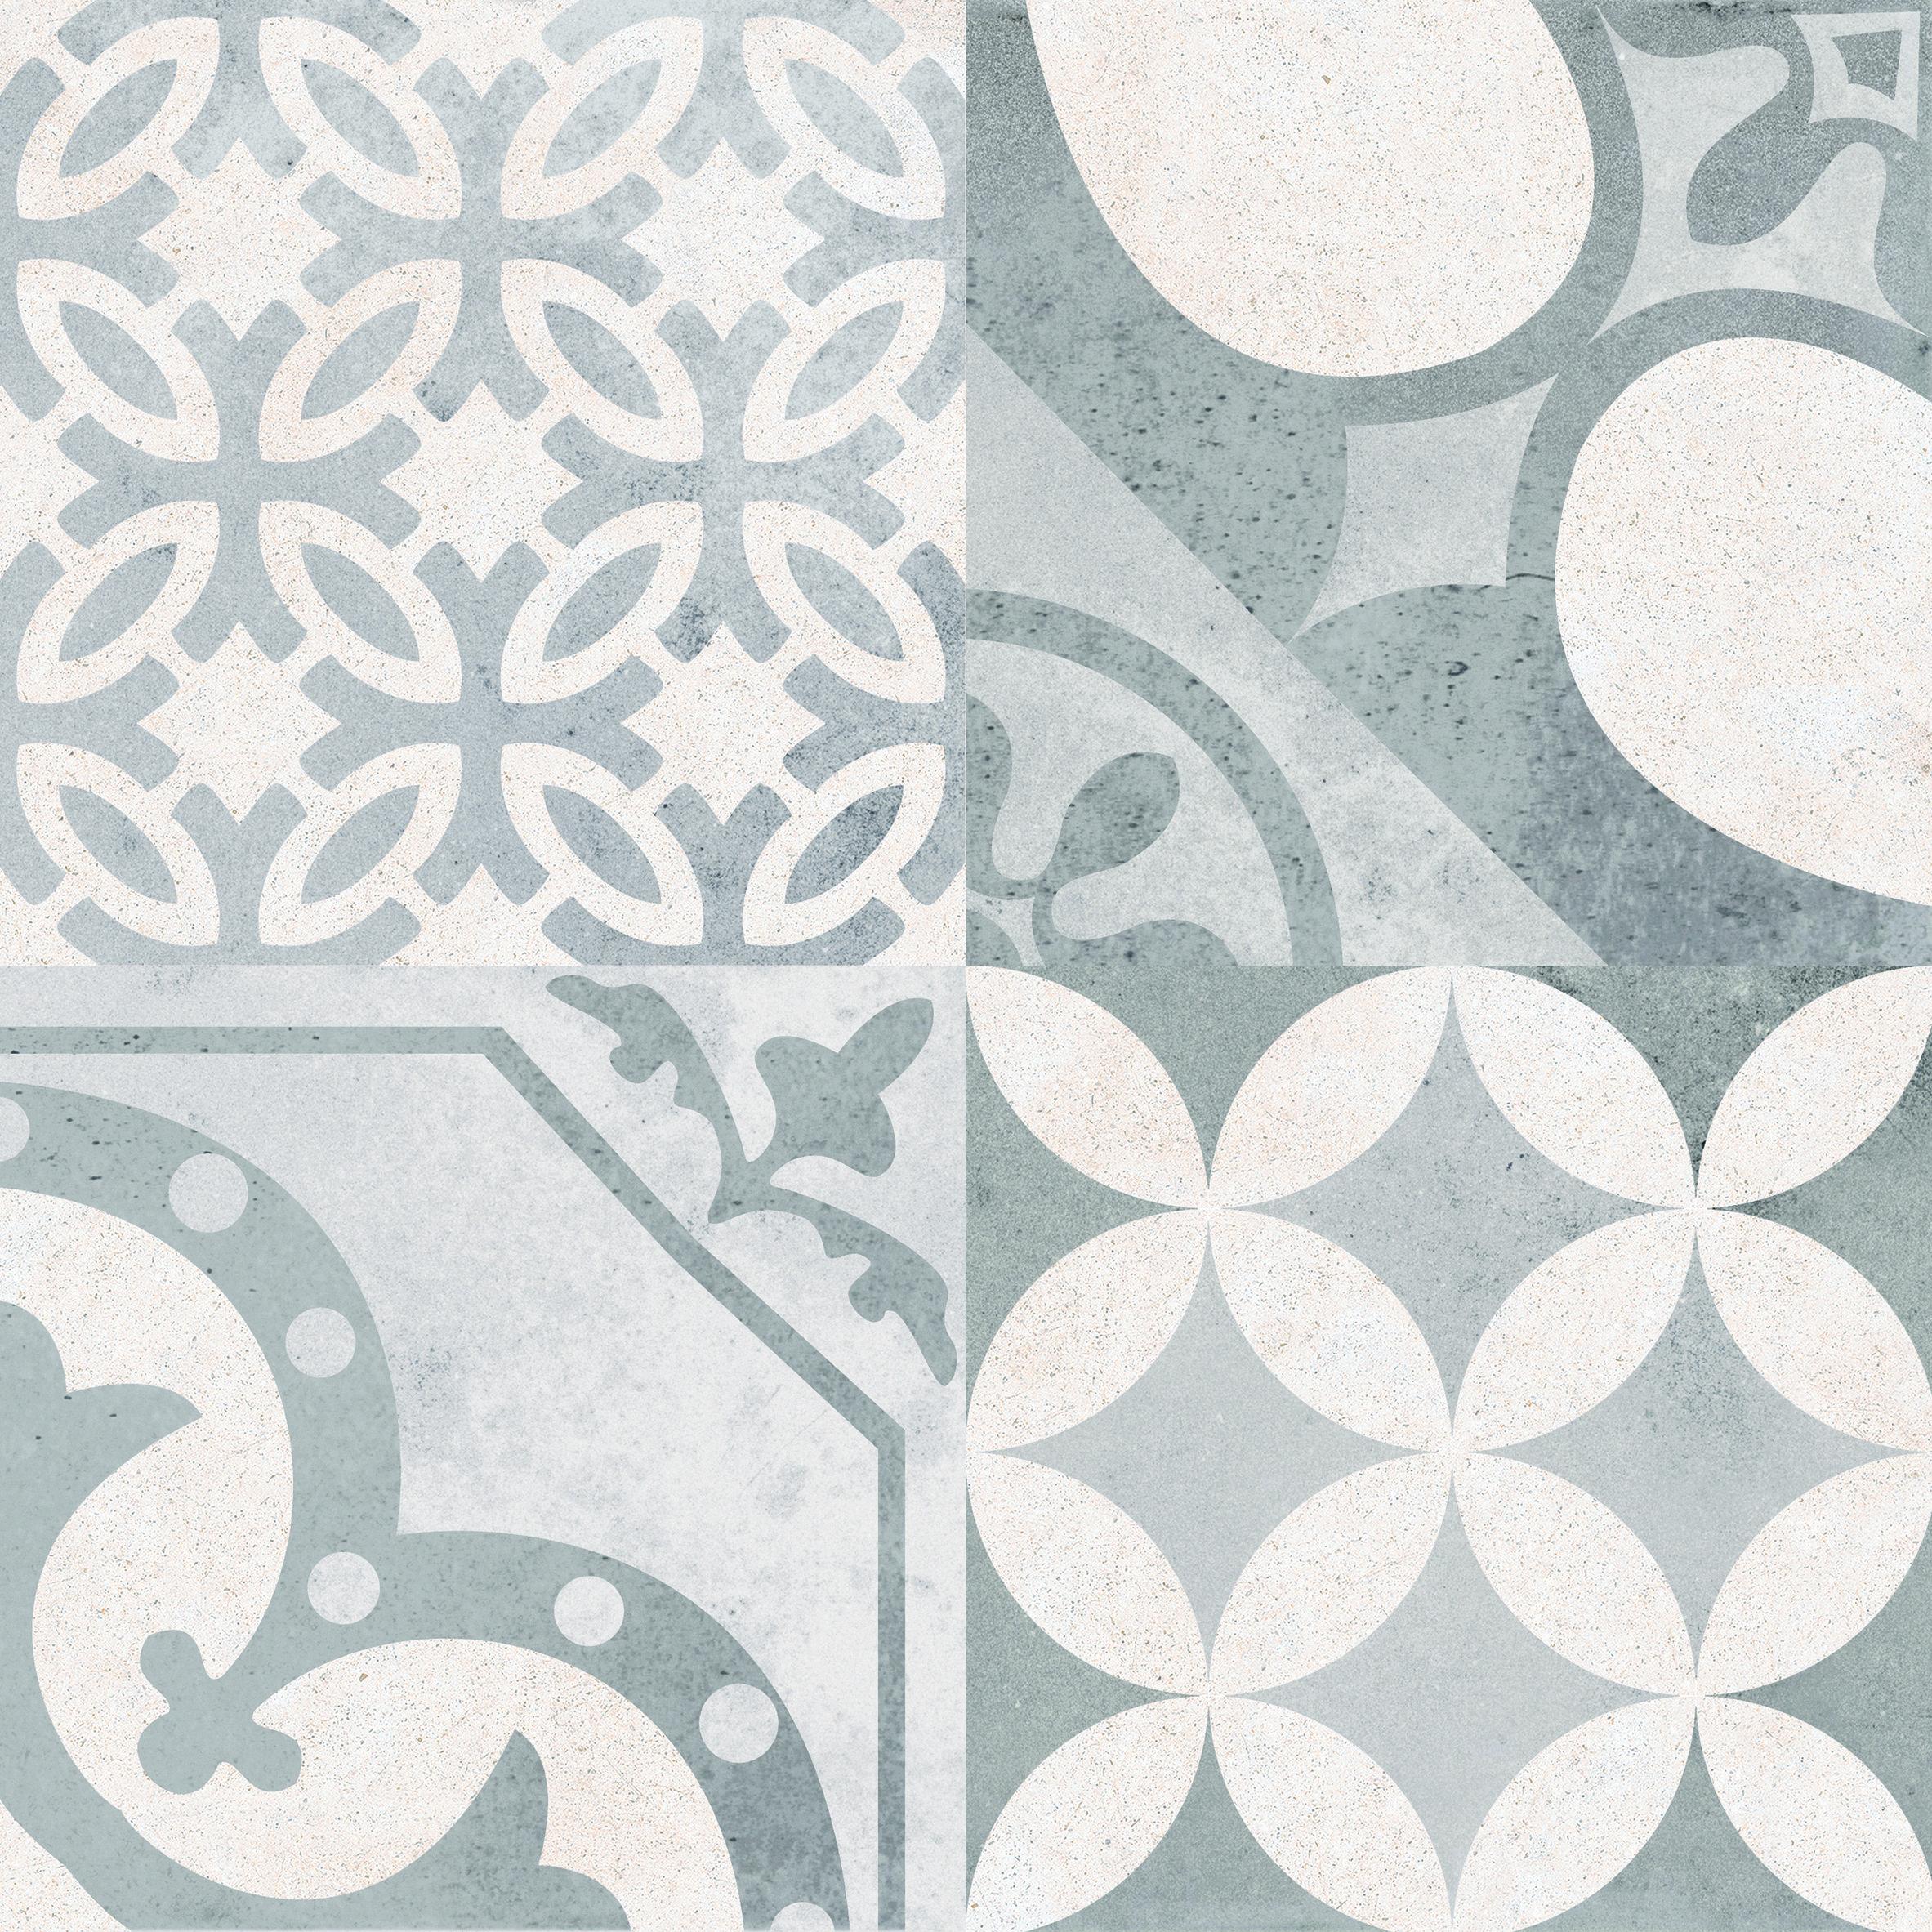 boheme patterned ceramic floor tile - 450x450mm gris available